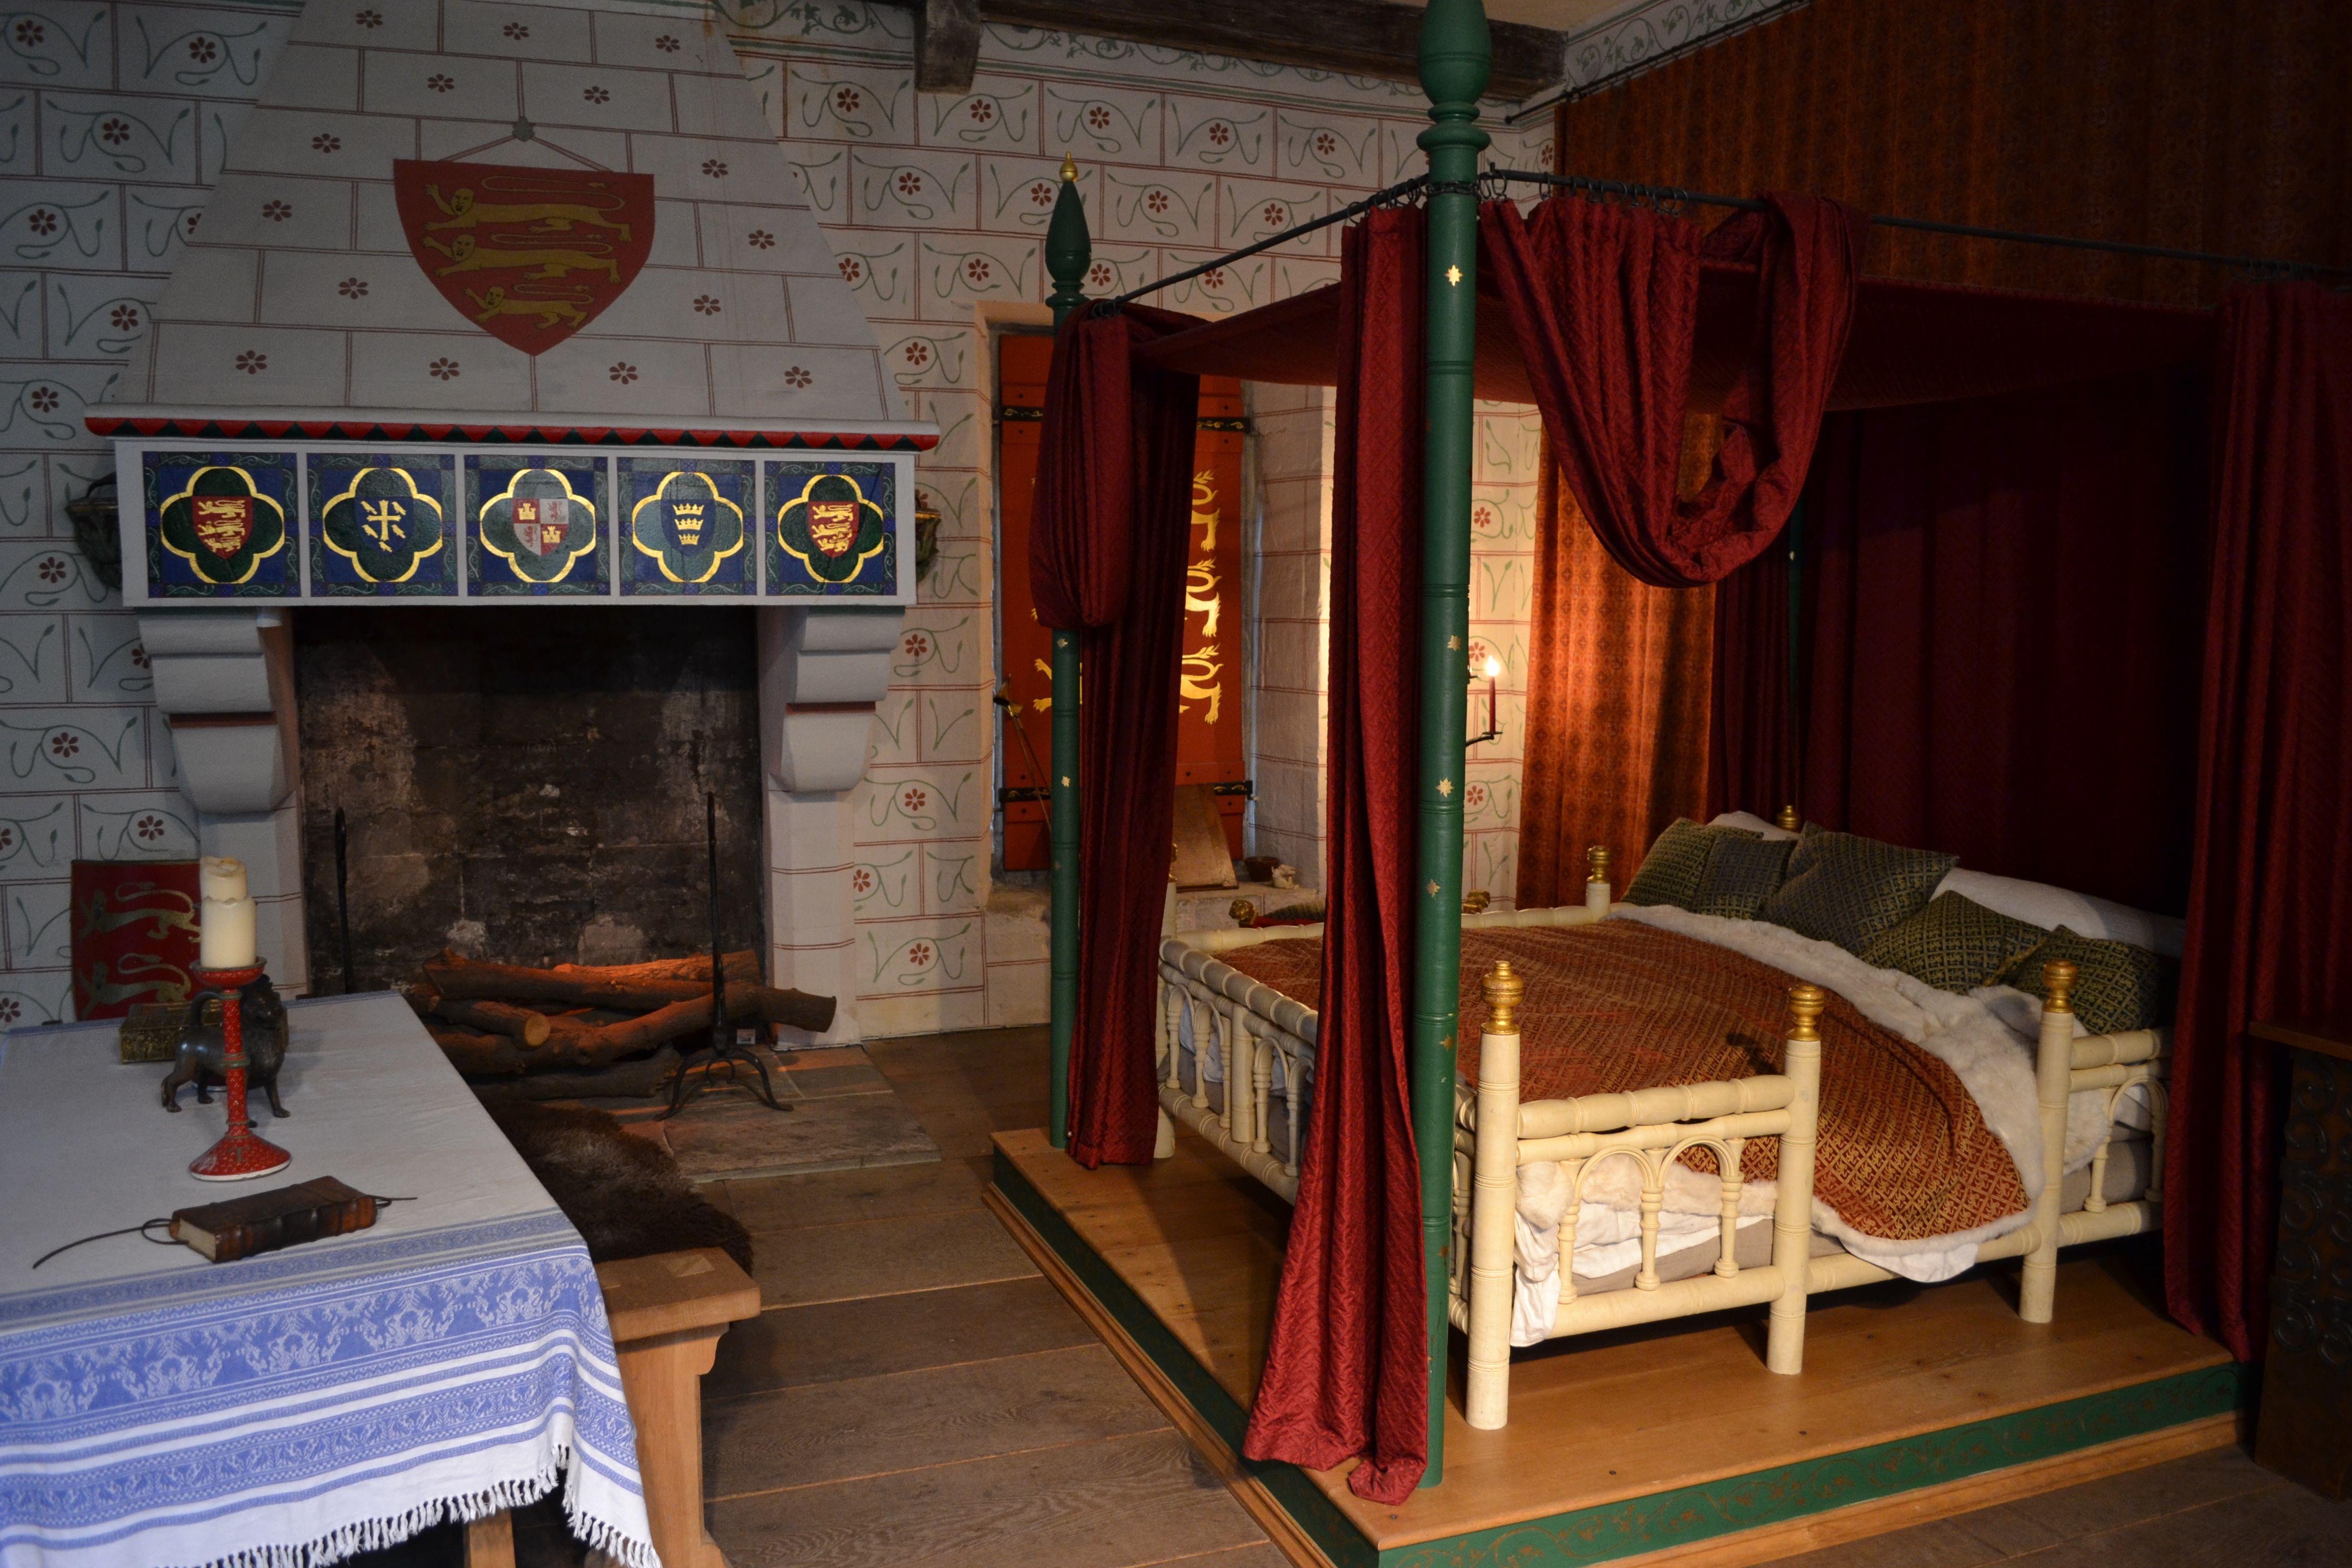 Medieval Bedroom Furniture. 35 Stunning Medieval Furniture Ideas for Your Bedroom london england tower of royal bedroom jpg  4608 3072 BED